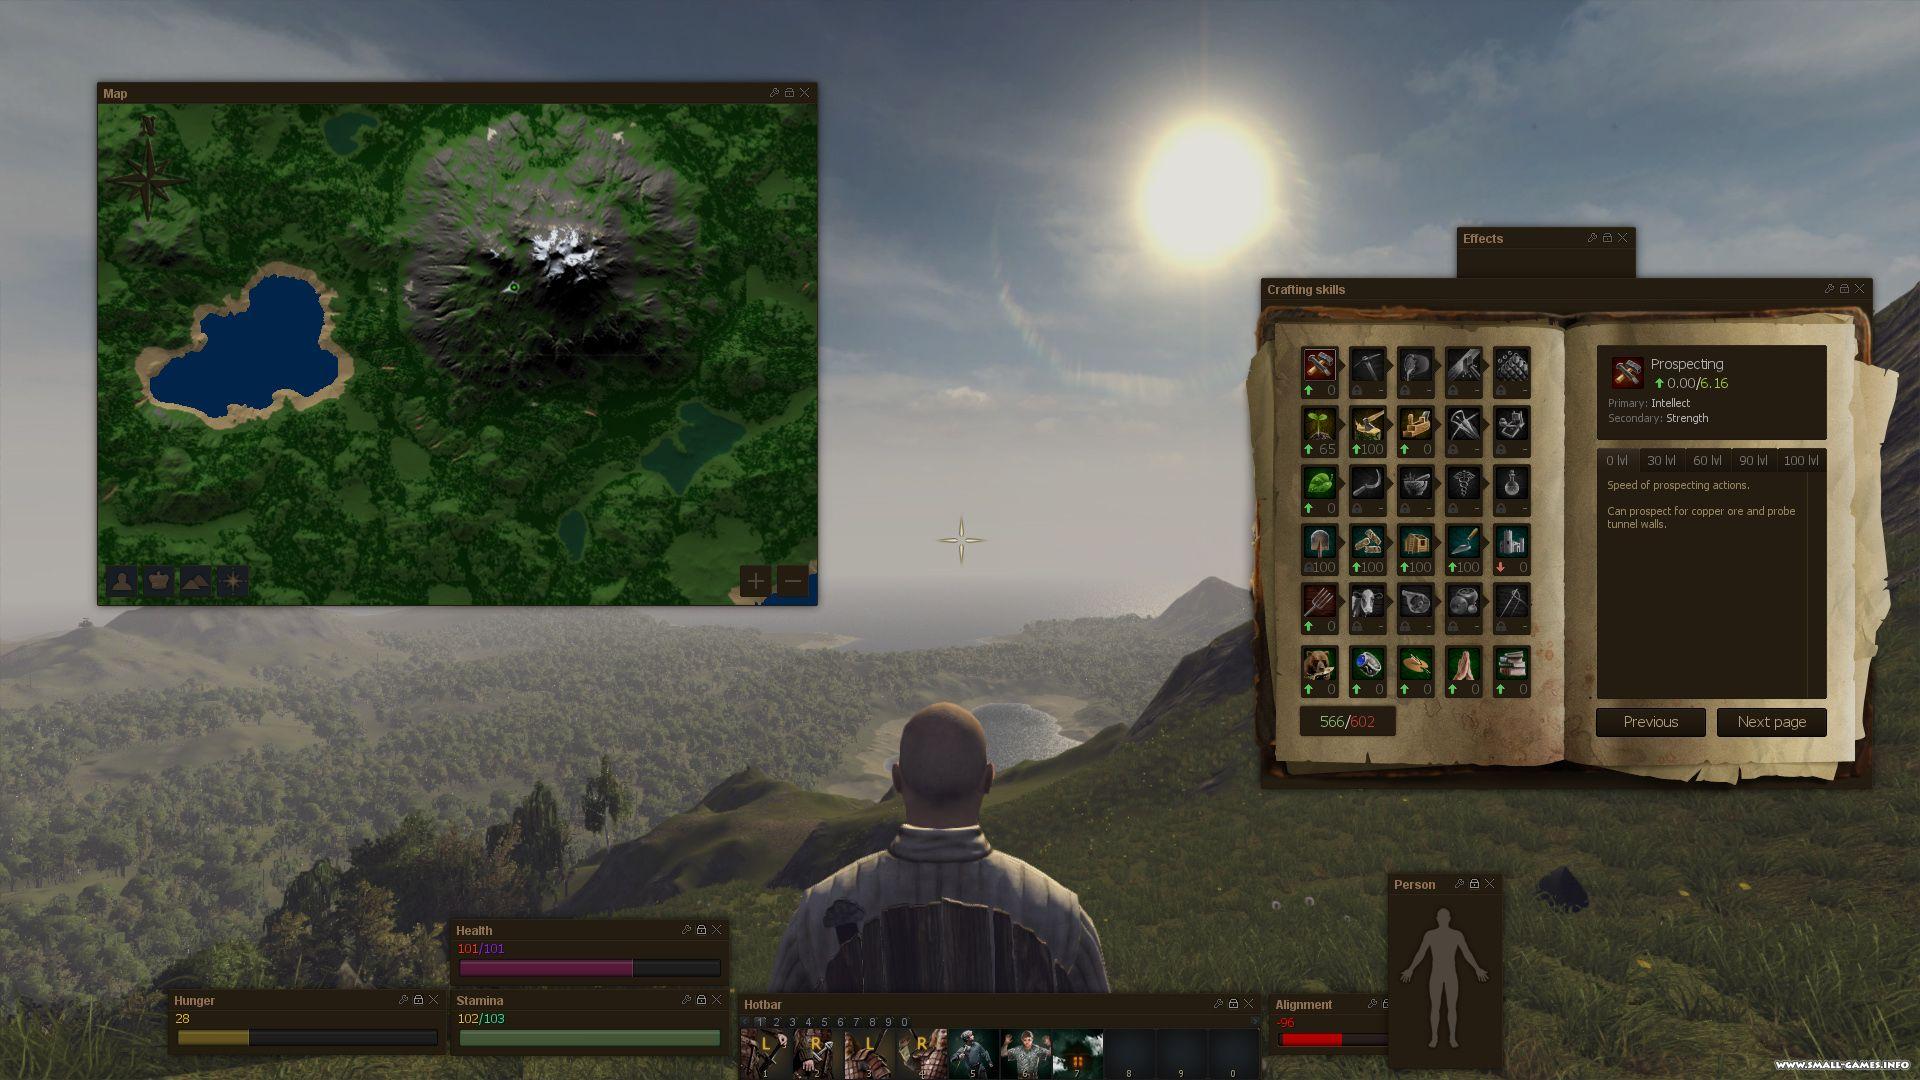 Life is feudal админ команды сценарий ролевая игра по продажам в2в